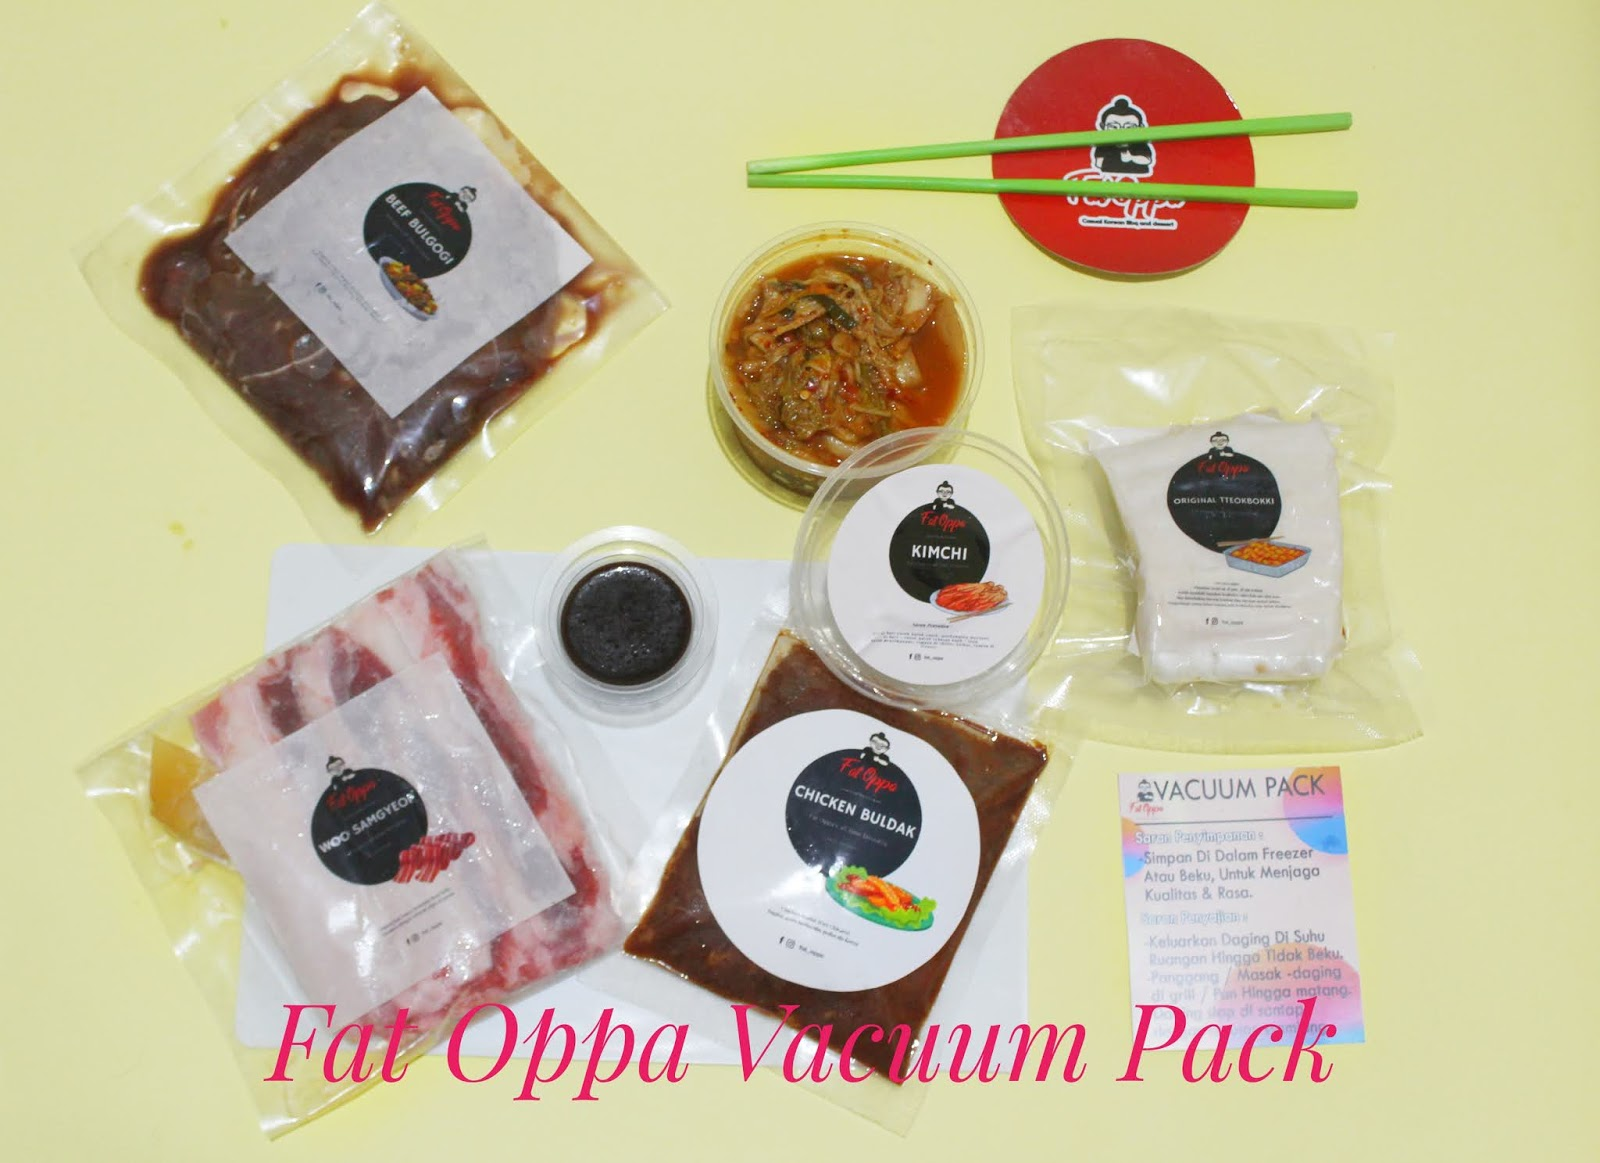 Fat Oppa Vacuum Pack